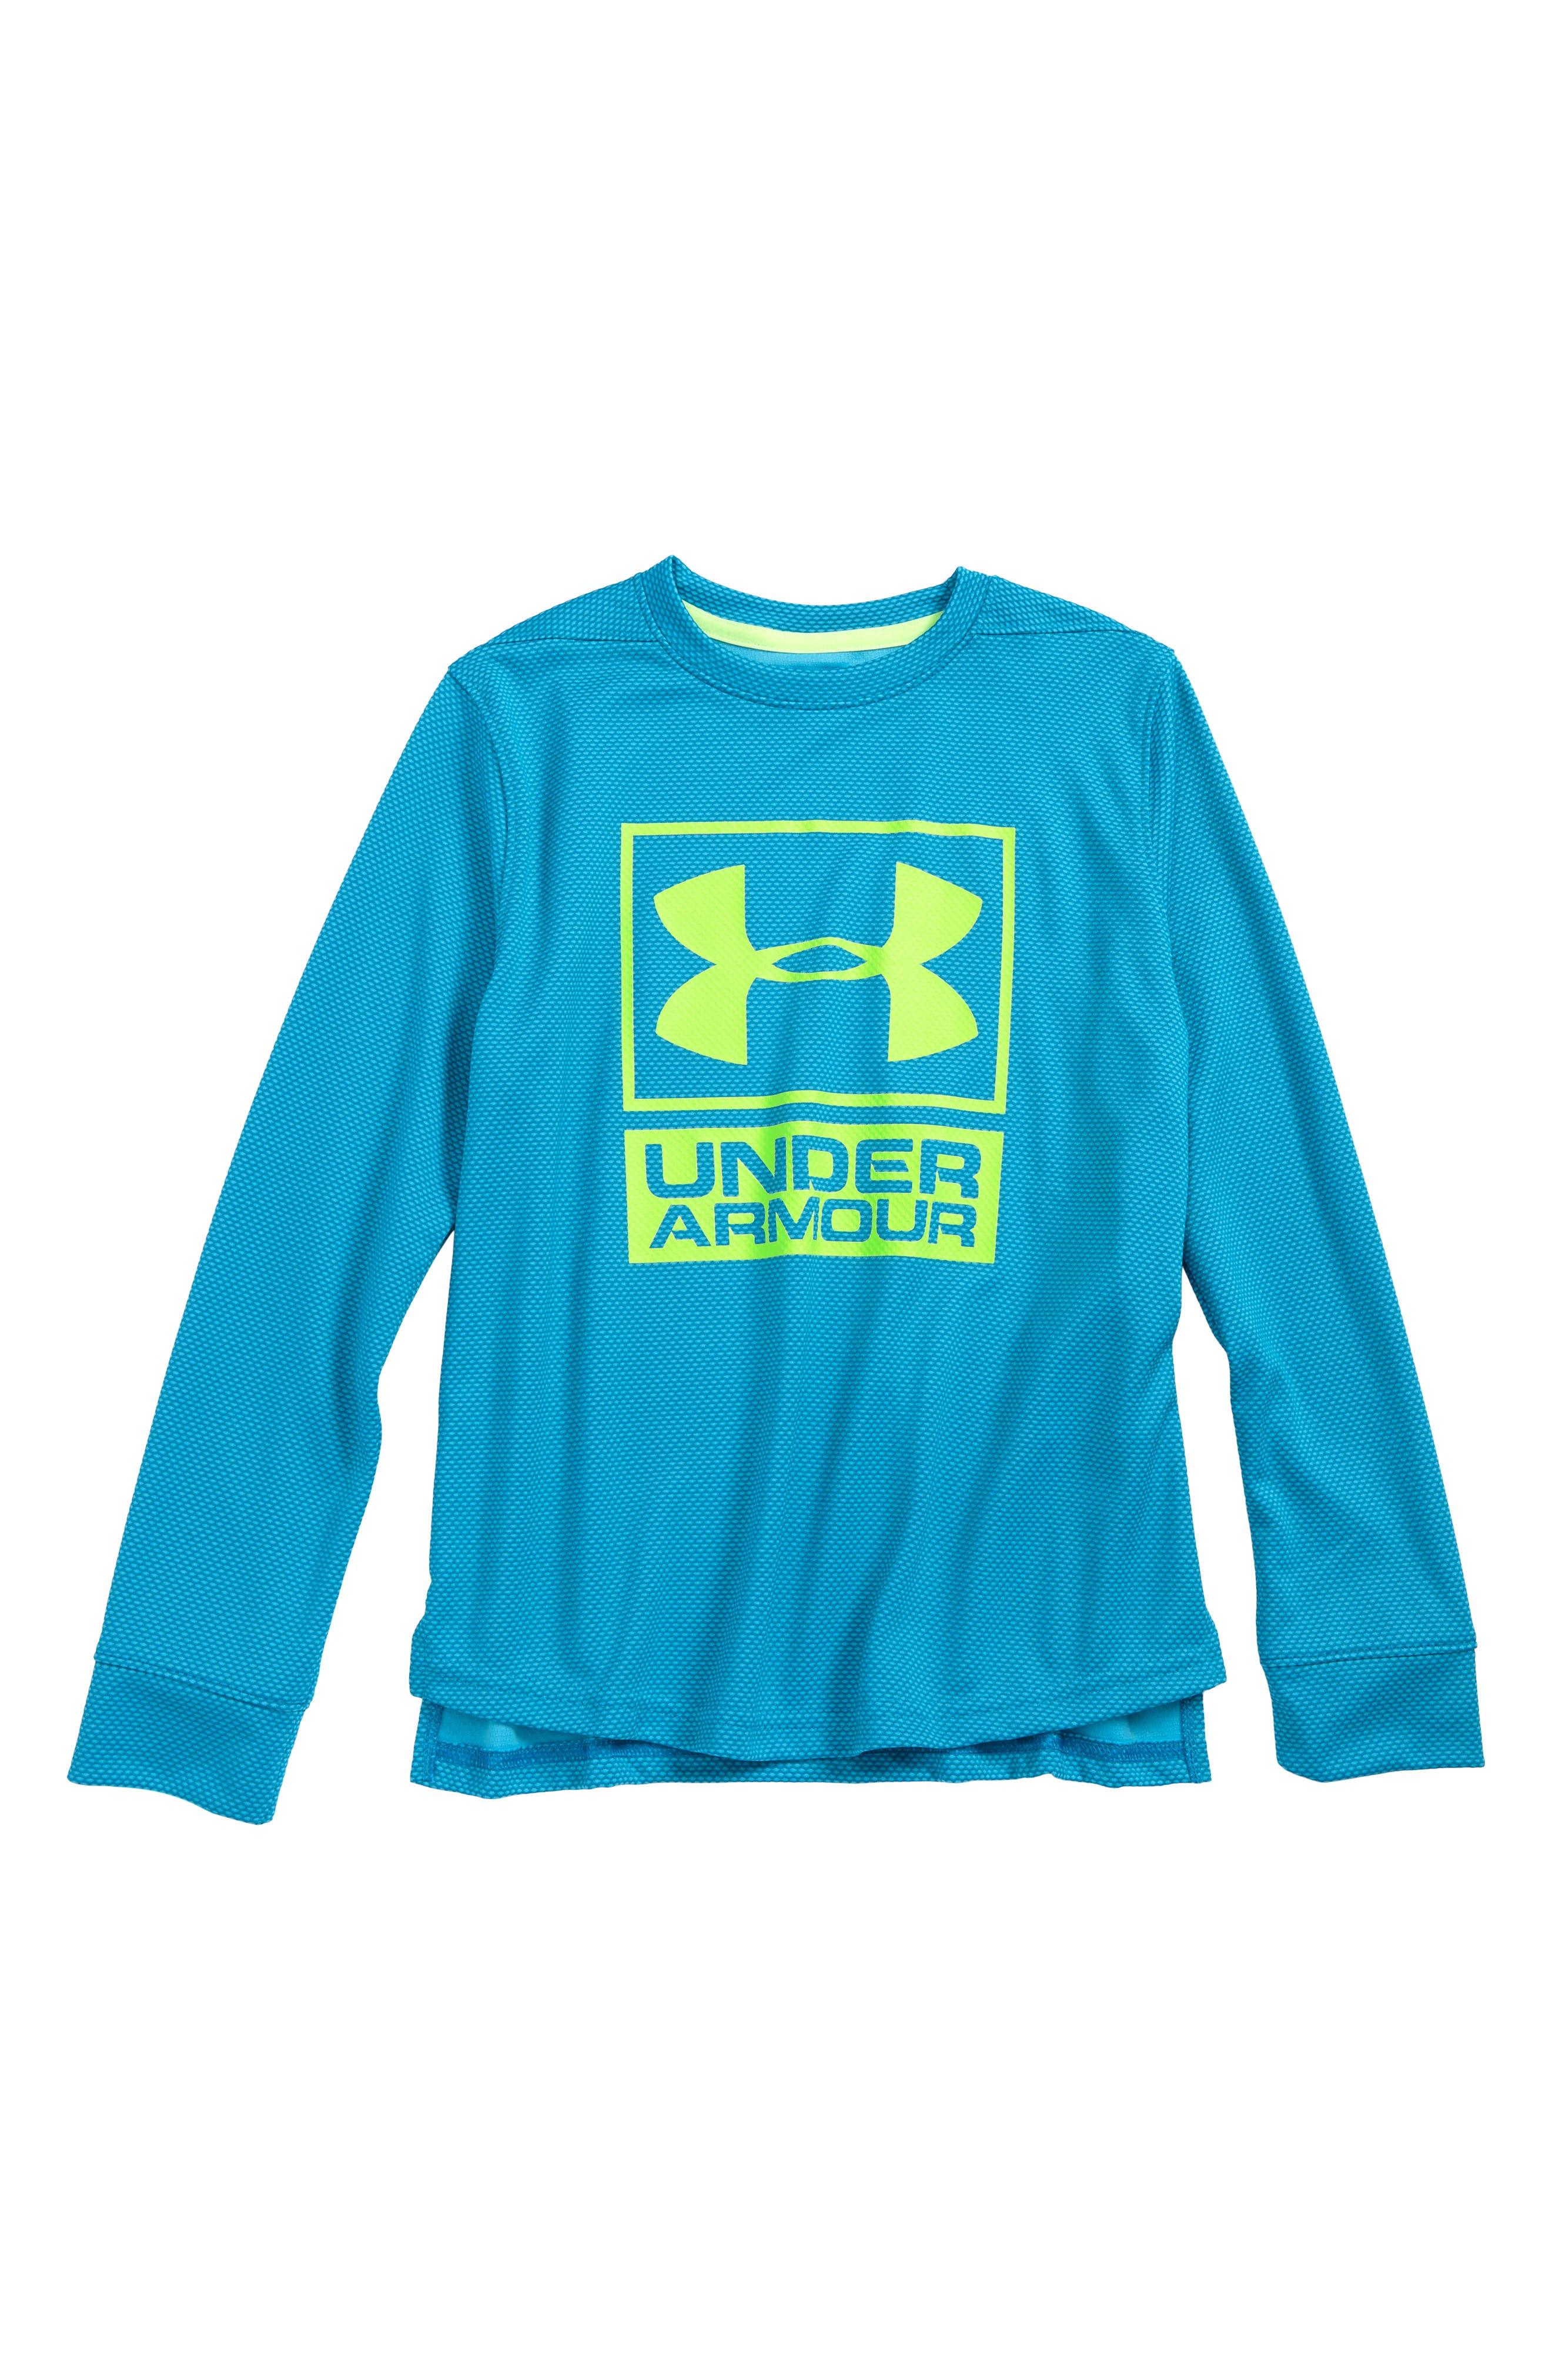 Alternate Image 1 Selected - Under Armour Logo Tech Shirt (Little Boys & Big Boys)